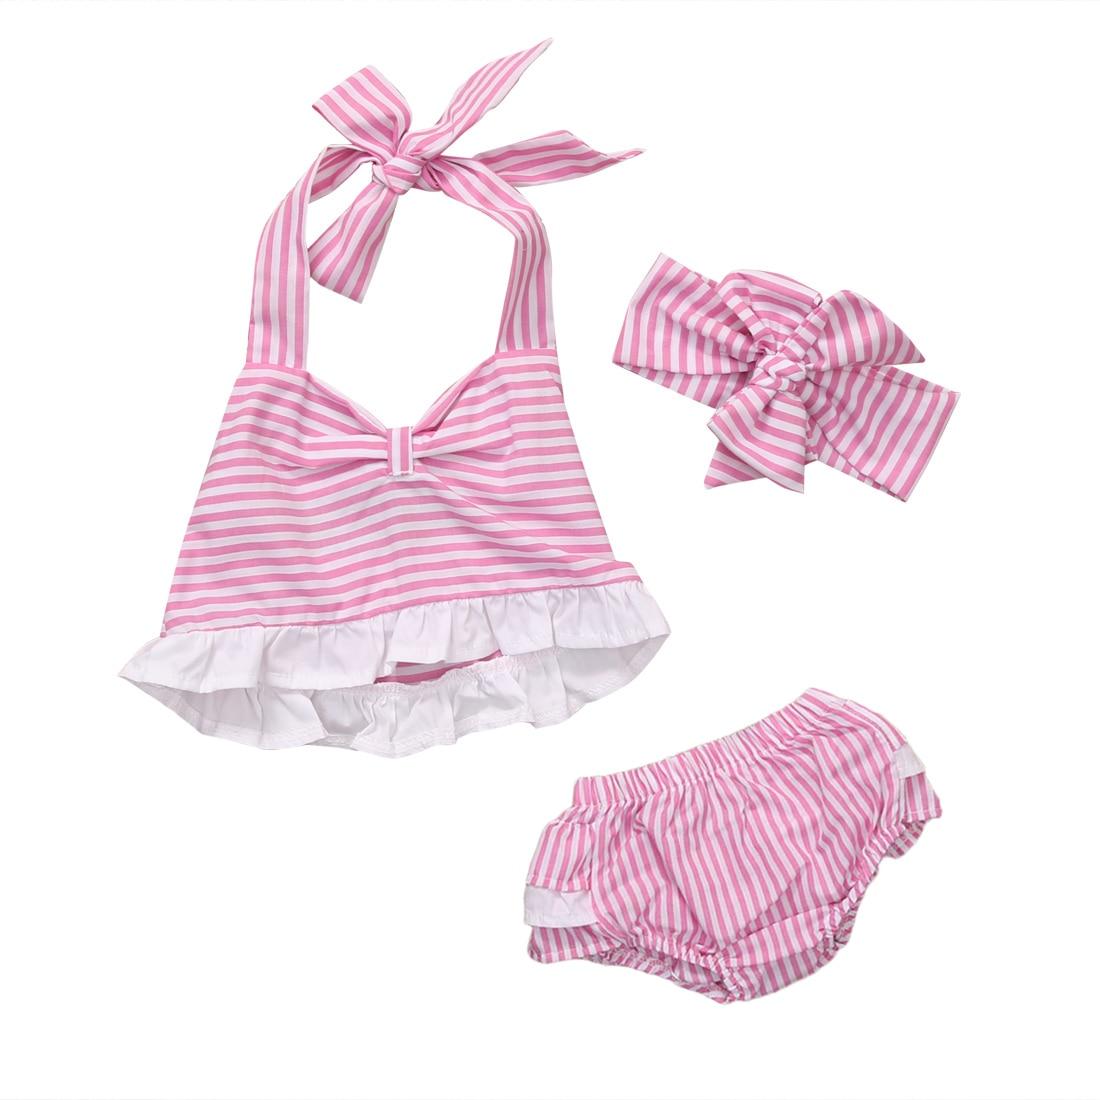 HOT Newborn Baby Girls Striped Short Tops+Bottoms+Headband Outfits 3Pcs Sets Summer Clothes